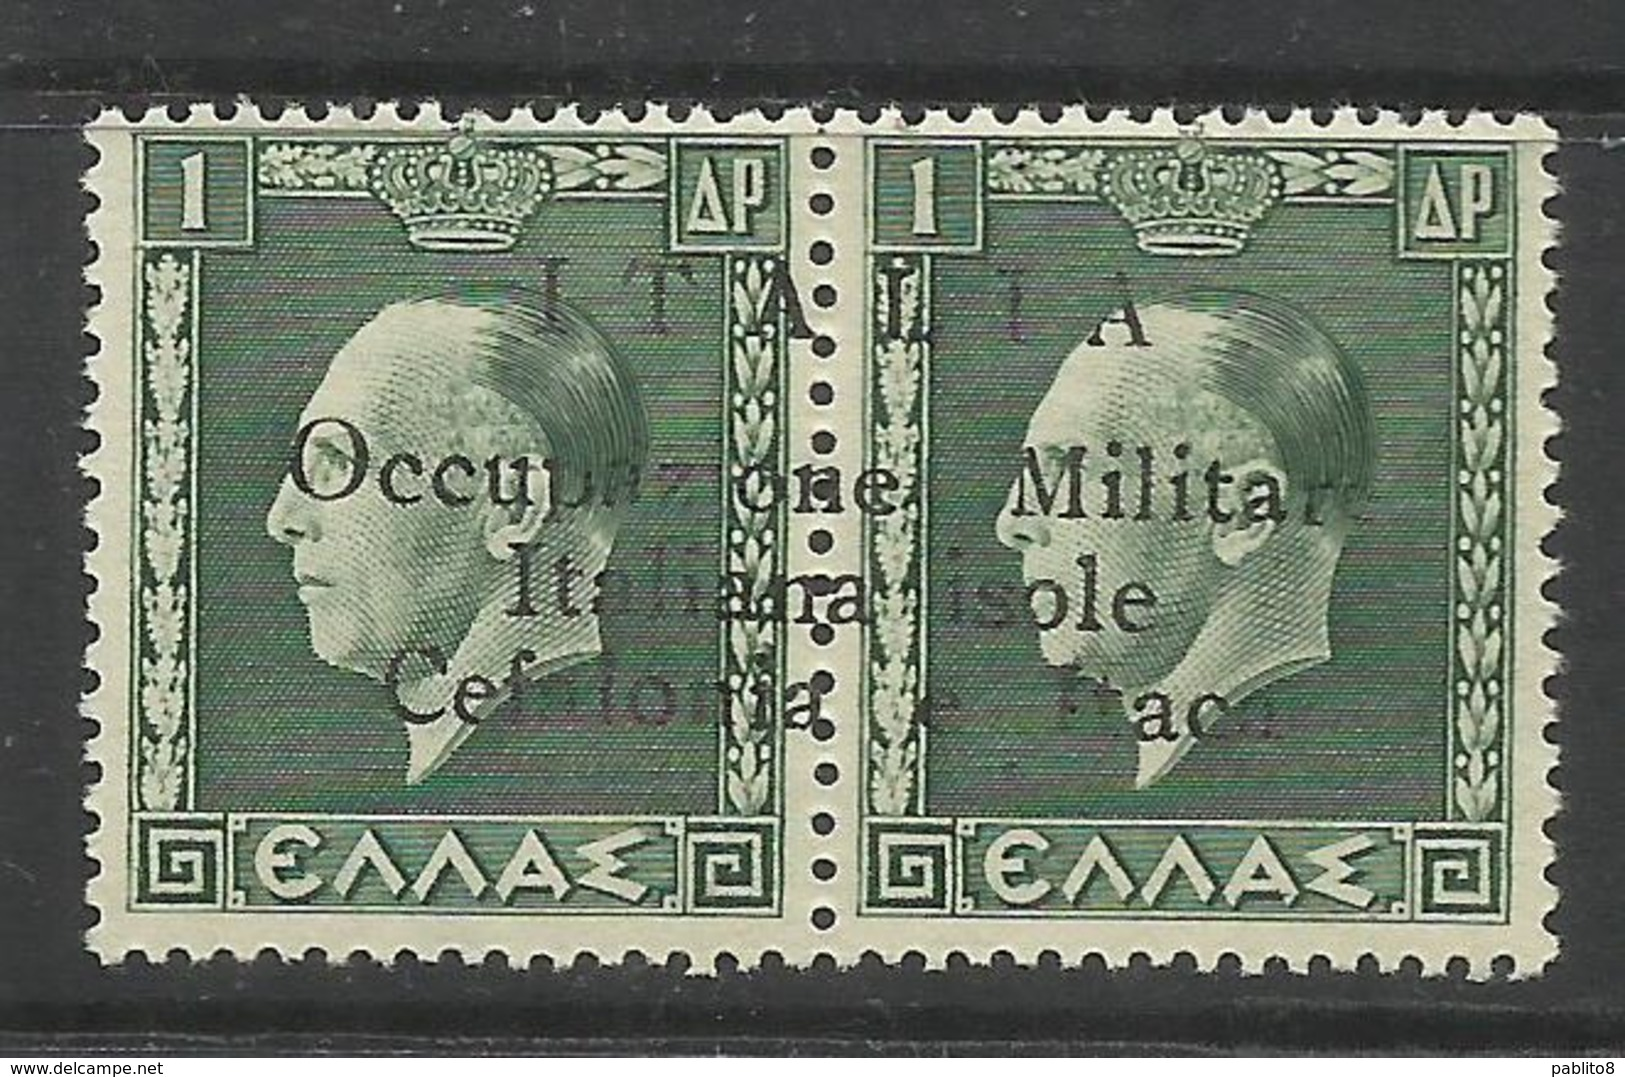 OCCUPAZIONE ITALIANA CEFALONIA E ITACA KEFALONIA ITHACA 1941 KING GEORGE II RE GIORGIO 1 D + 1 D MNH FIRMATO SIGNED - Bezetting 2° Wereldoorlog (Italië)